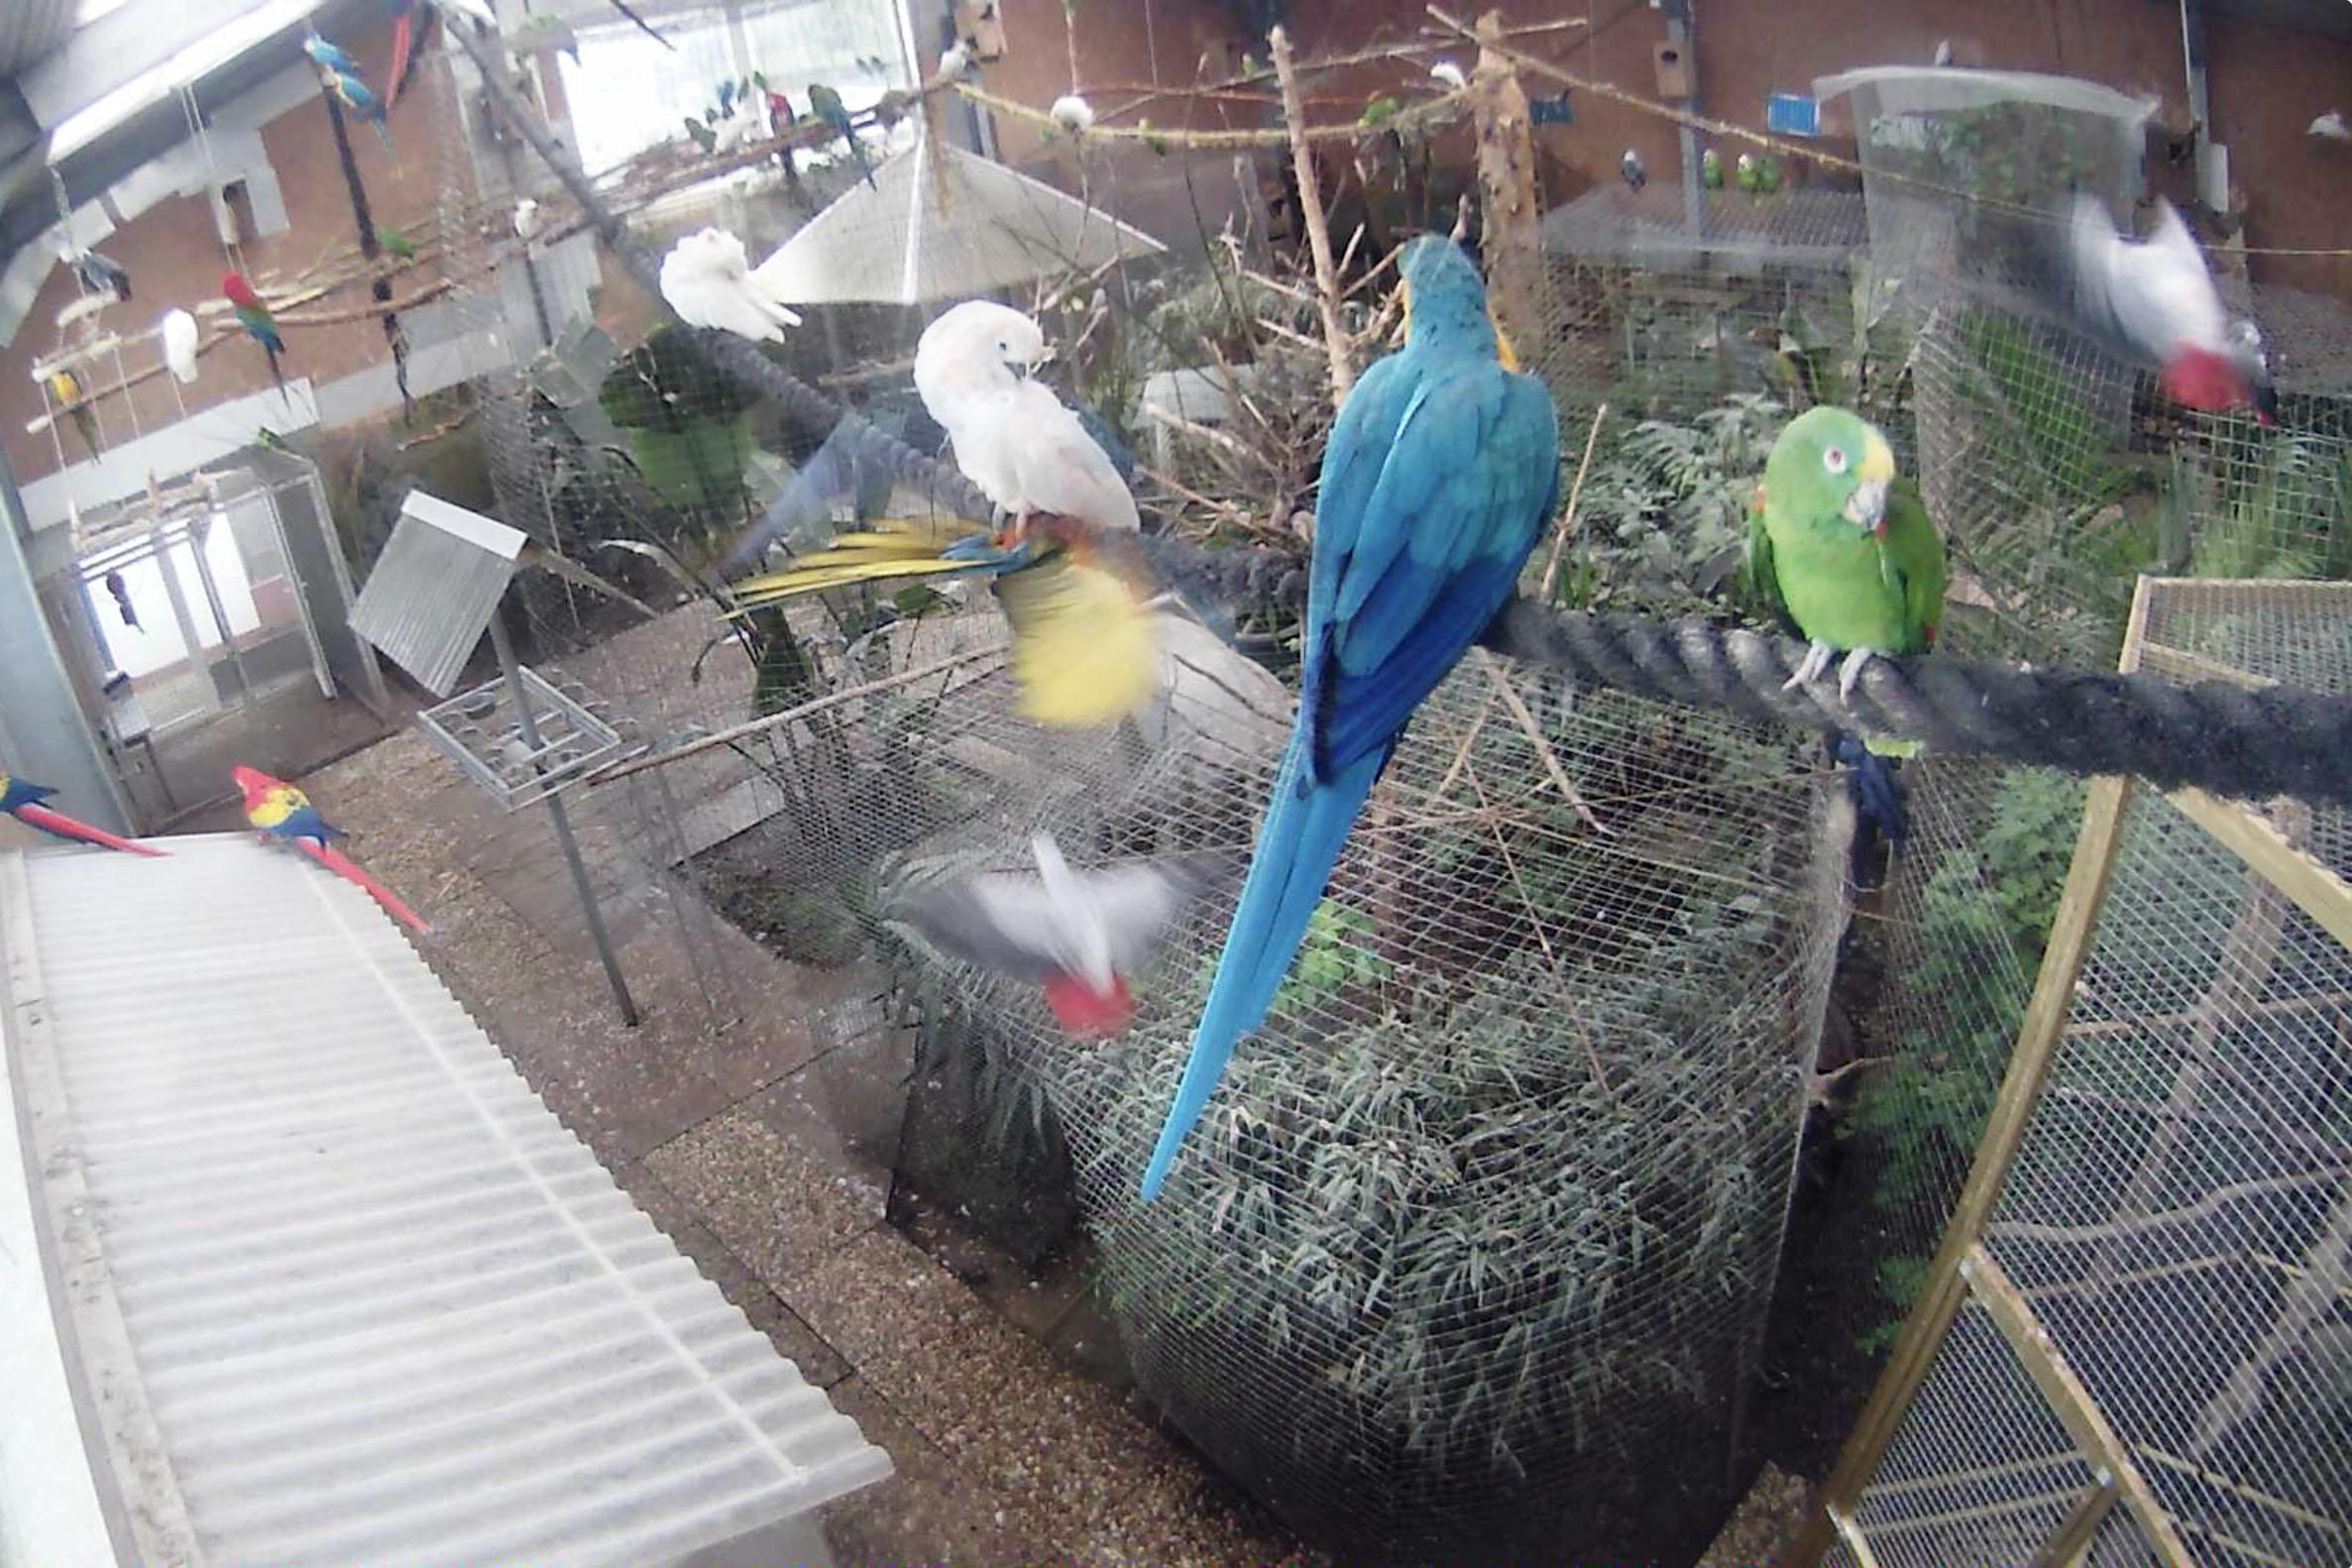 uccellirid.jpg